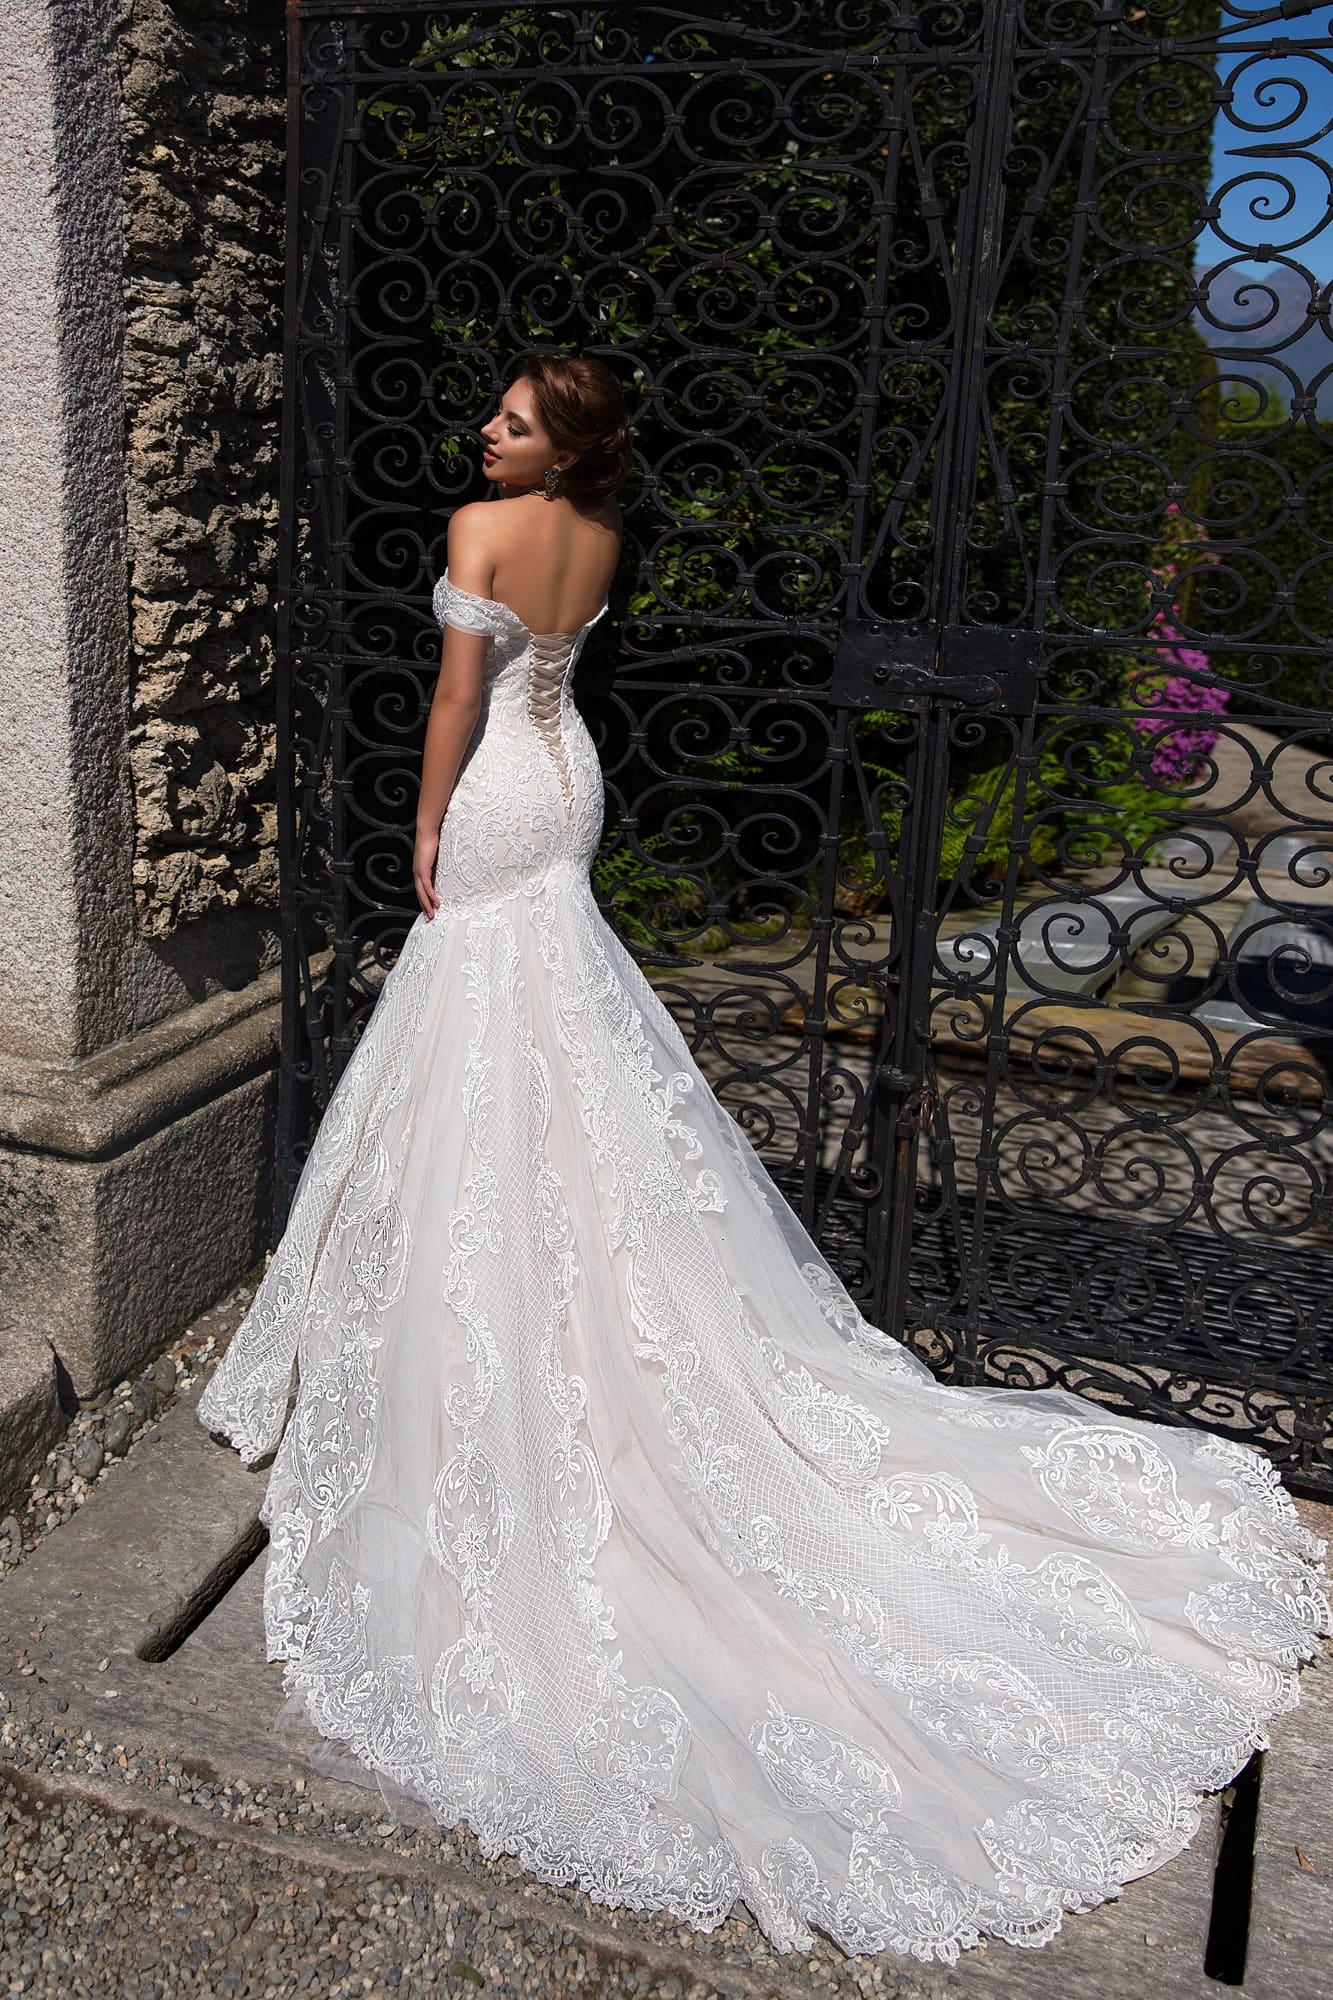 Image 3 - Off Shoulder Mermaid Wedding Dress 2020 Lace Up Back Appliqued Tulle Wedding Gowns Bride Dress Lace Wedding Dress MariageWedding Dresses   -